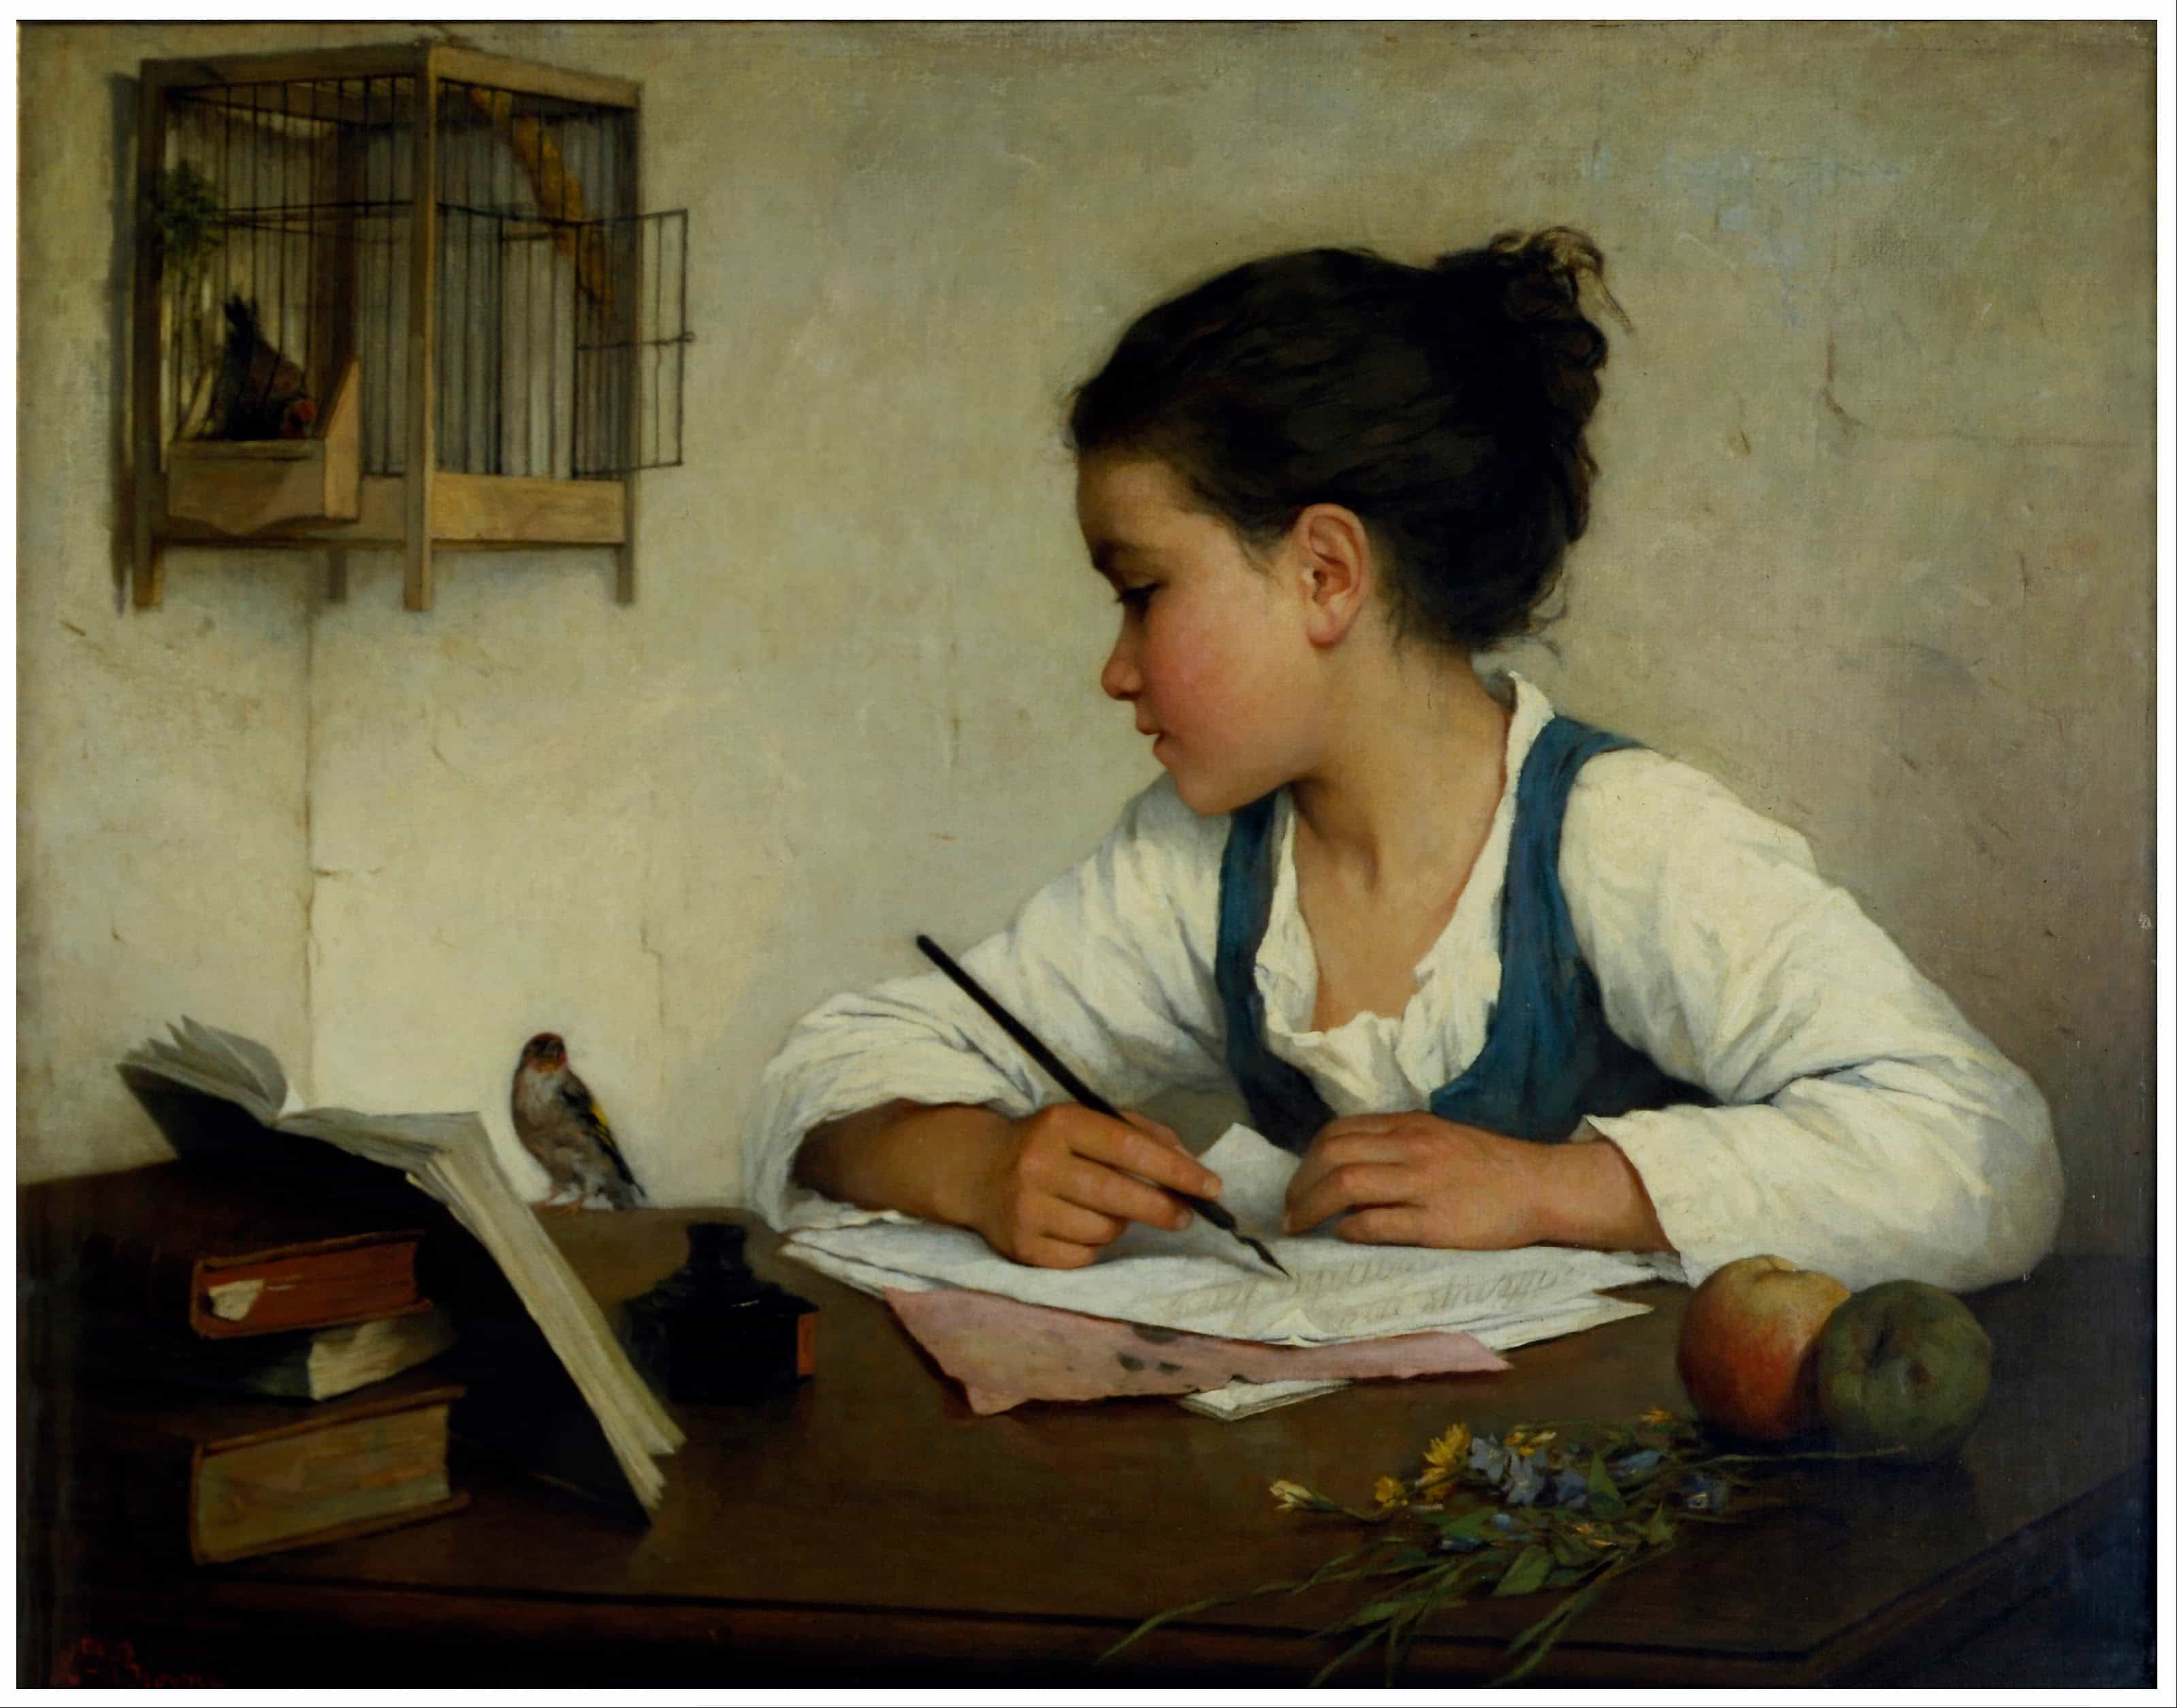 browne_henriette_-_a_girl_writing_the_pet_goldfinch_-_google_art_project